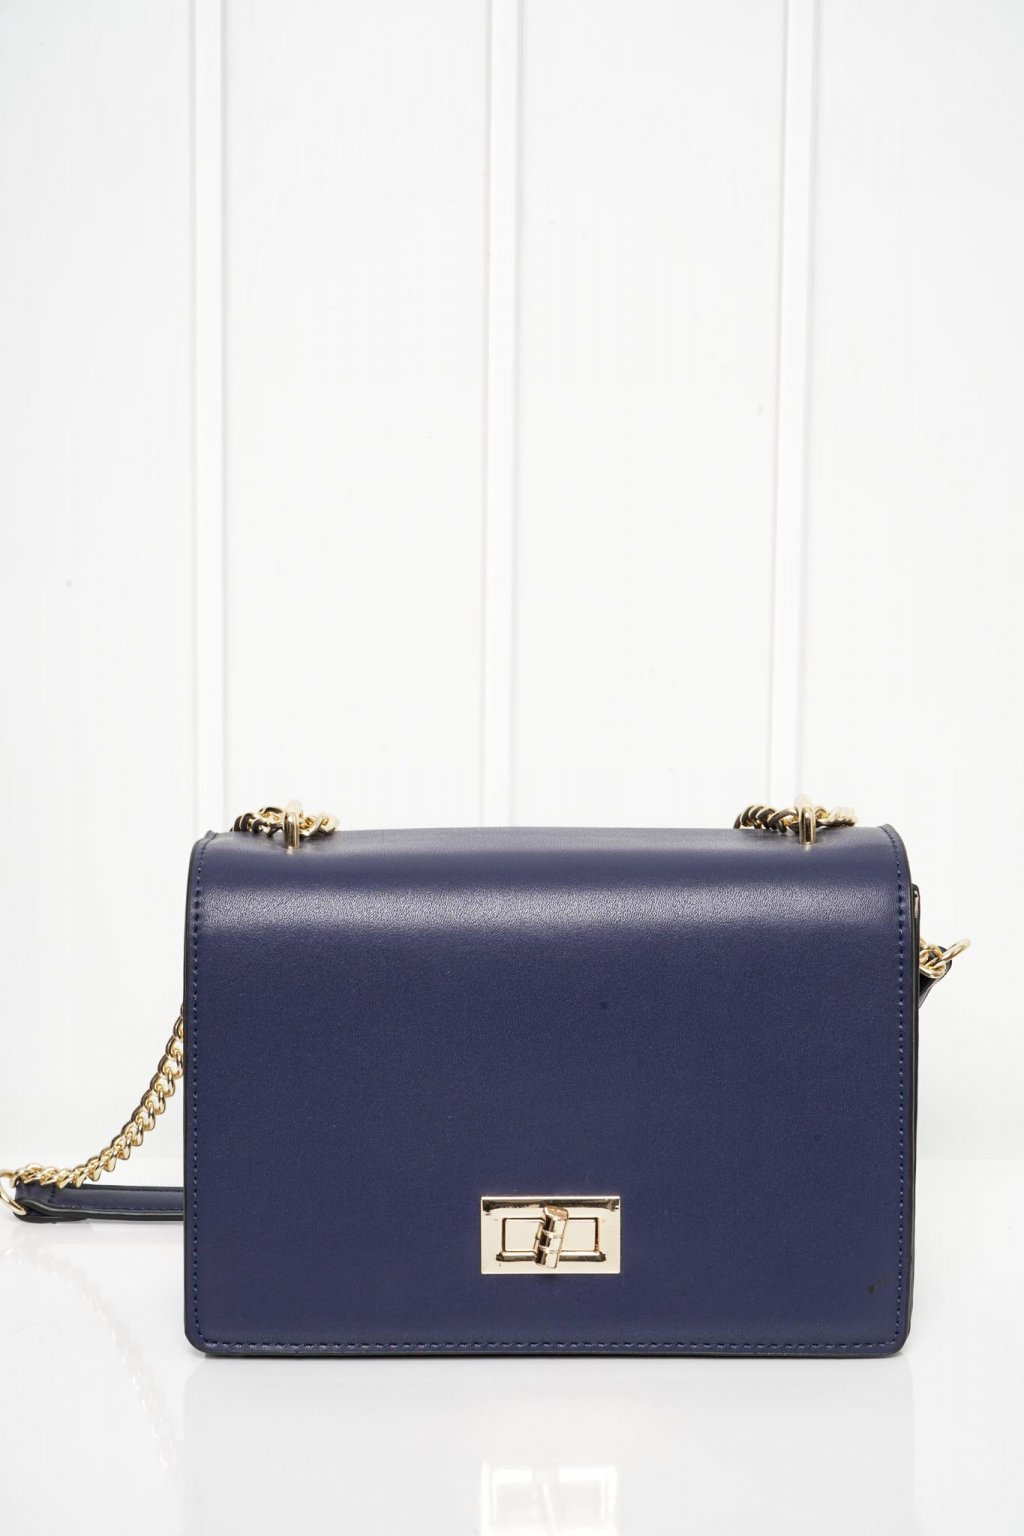 Kabelka, crossbody, ruksak, shopping bag, shopperka, 254